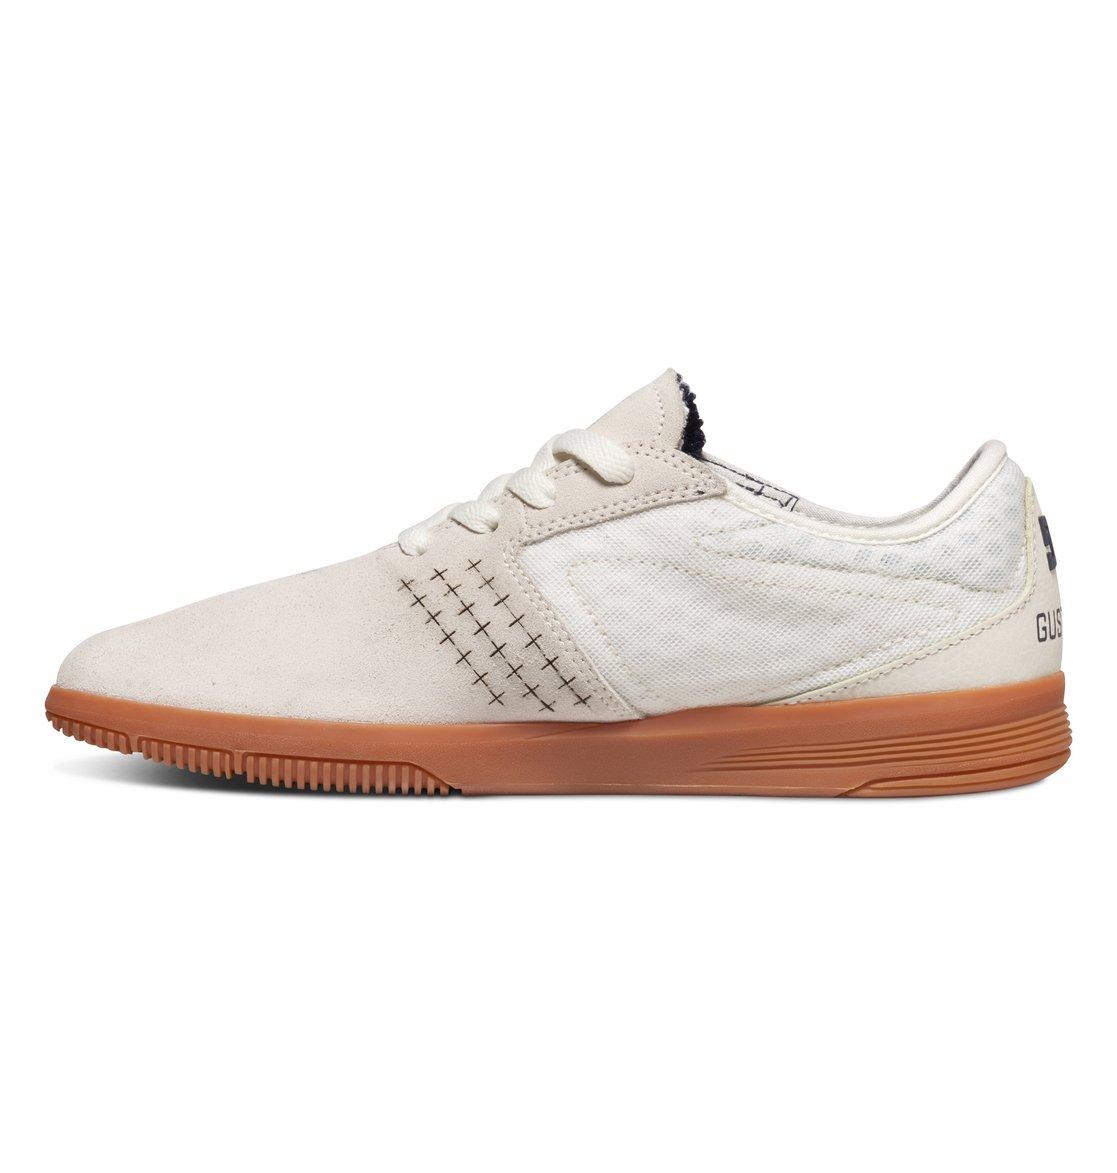 DC Shoes New Jack S - Skate Shoes - Chaussures de skate - Homme